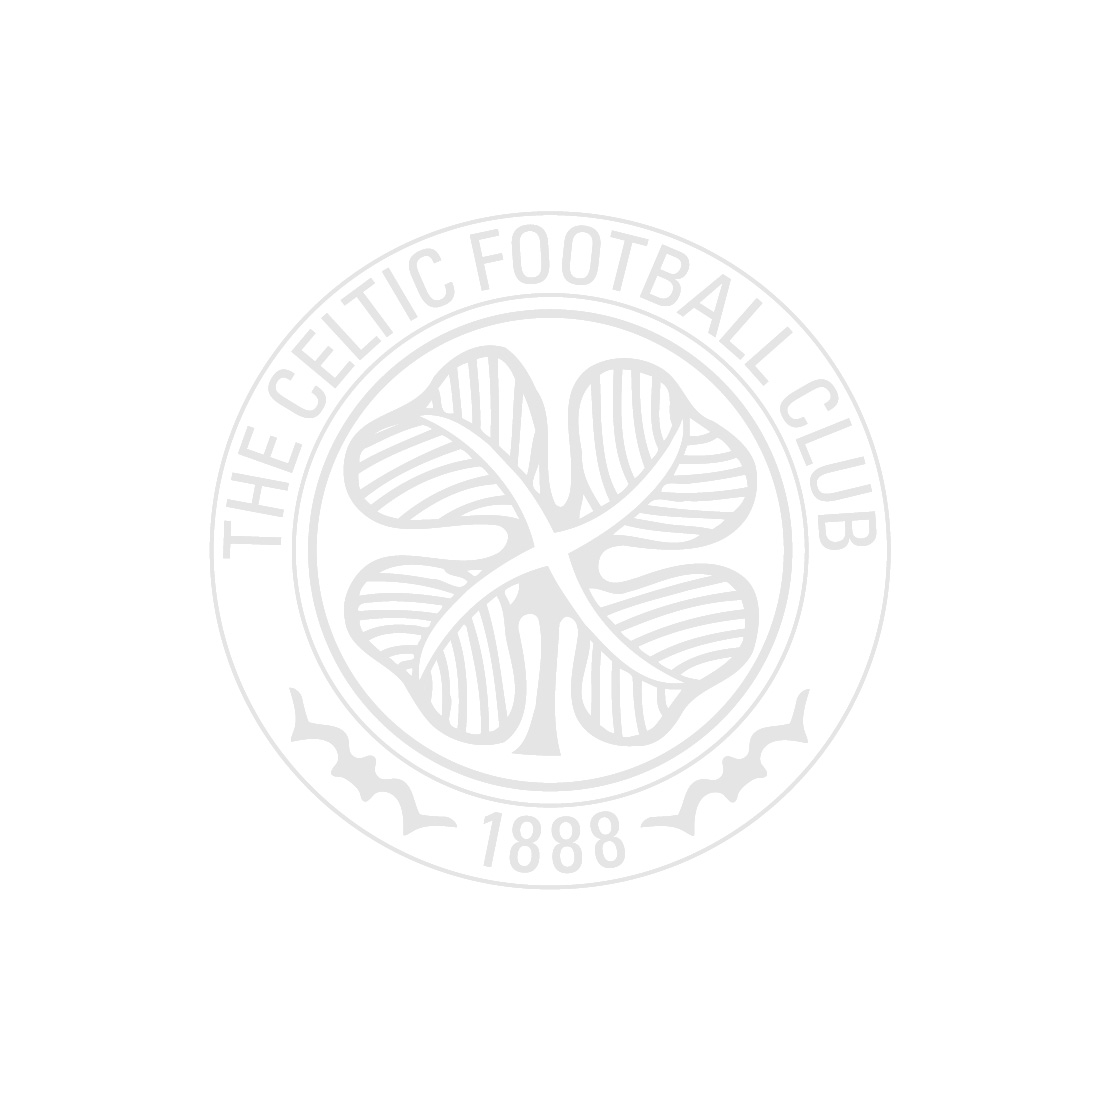 Celtic Henrik Larsson Signed Print